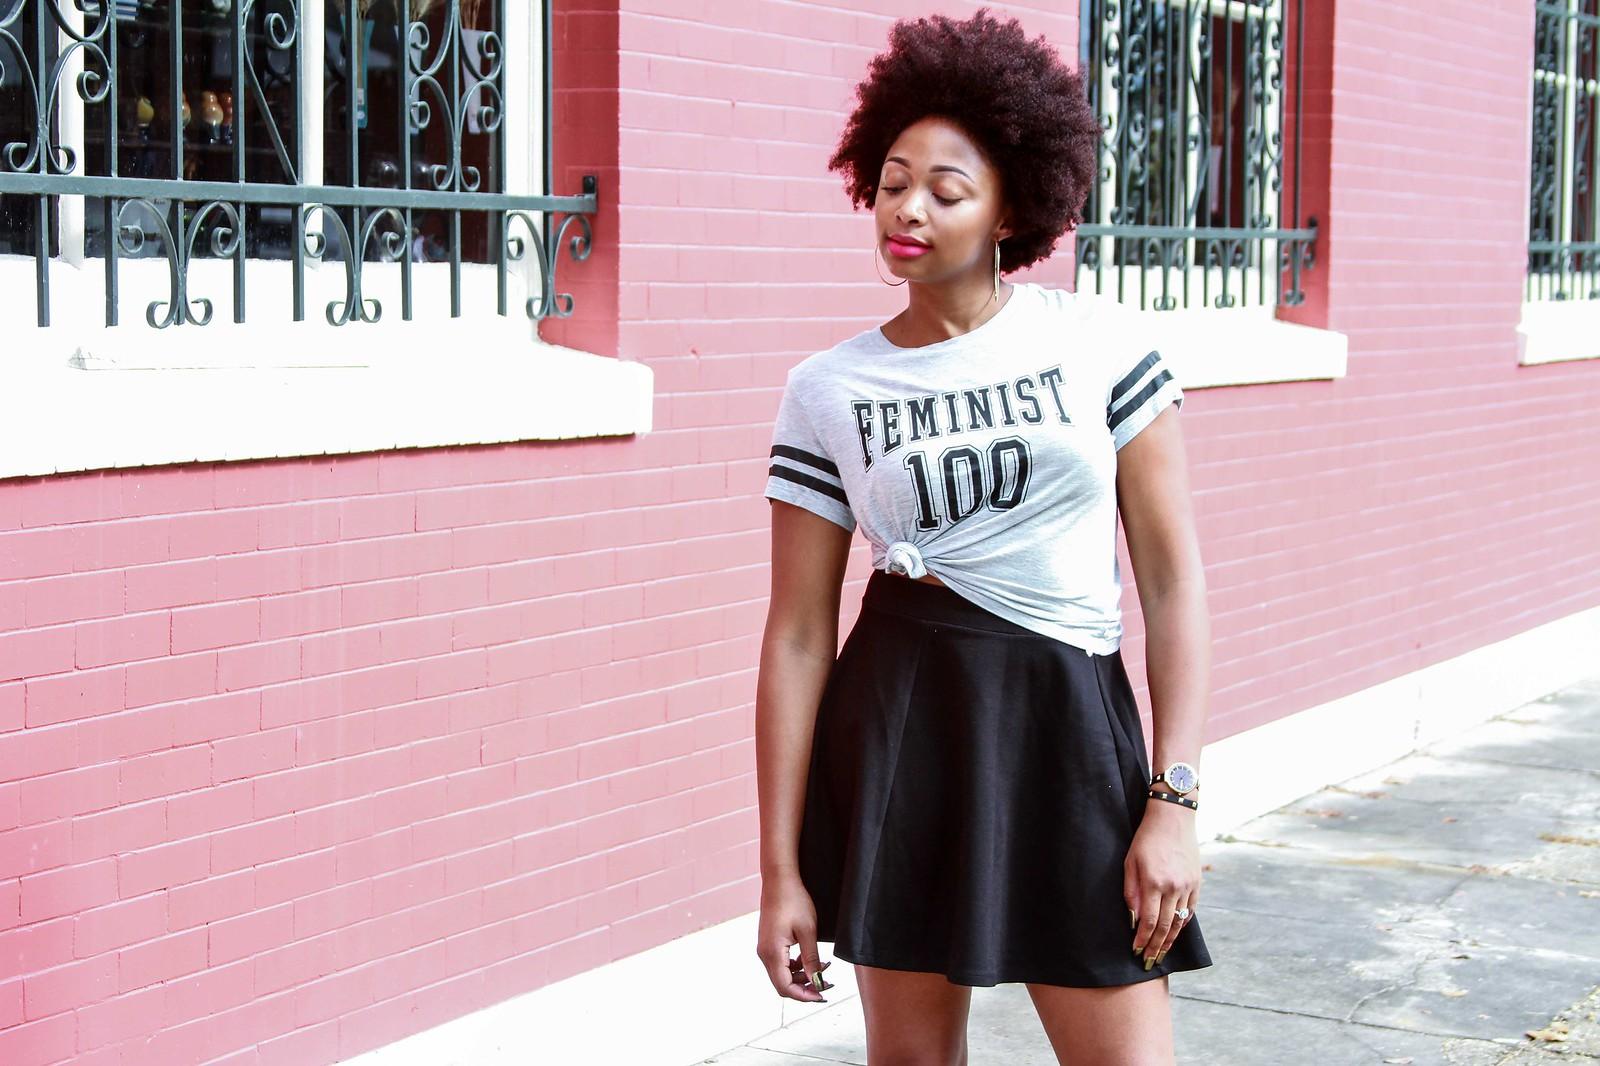 natural hair style blogger, Dallas fashion blogger